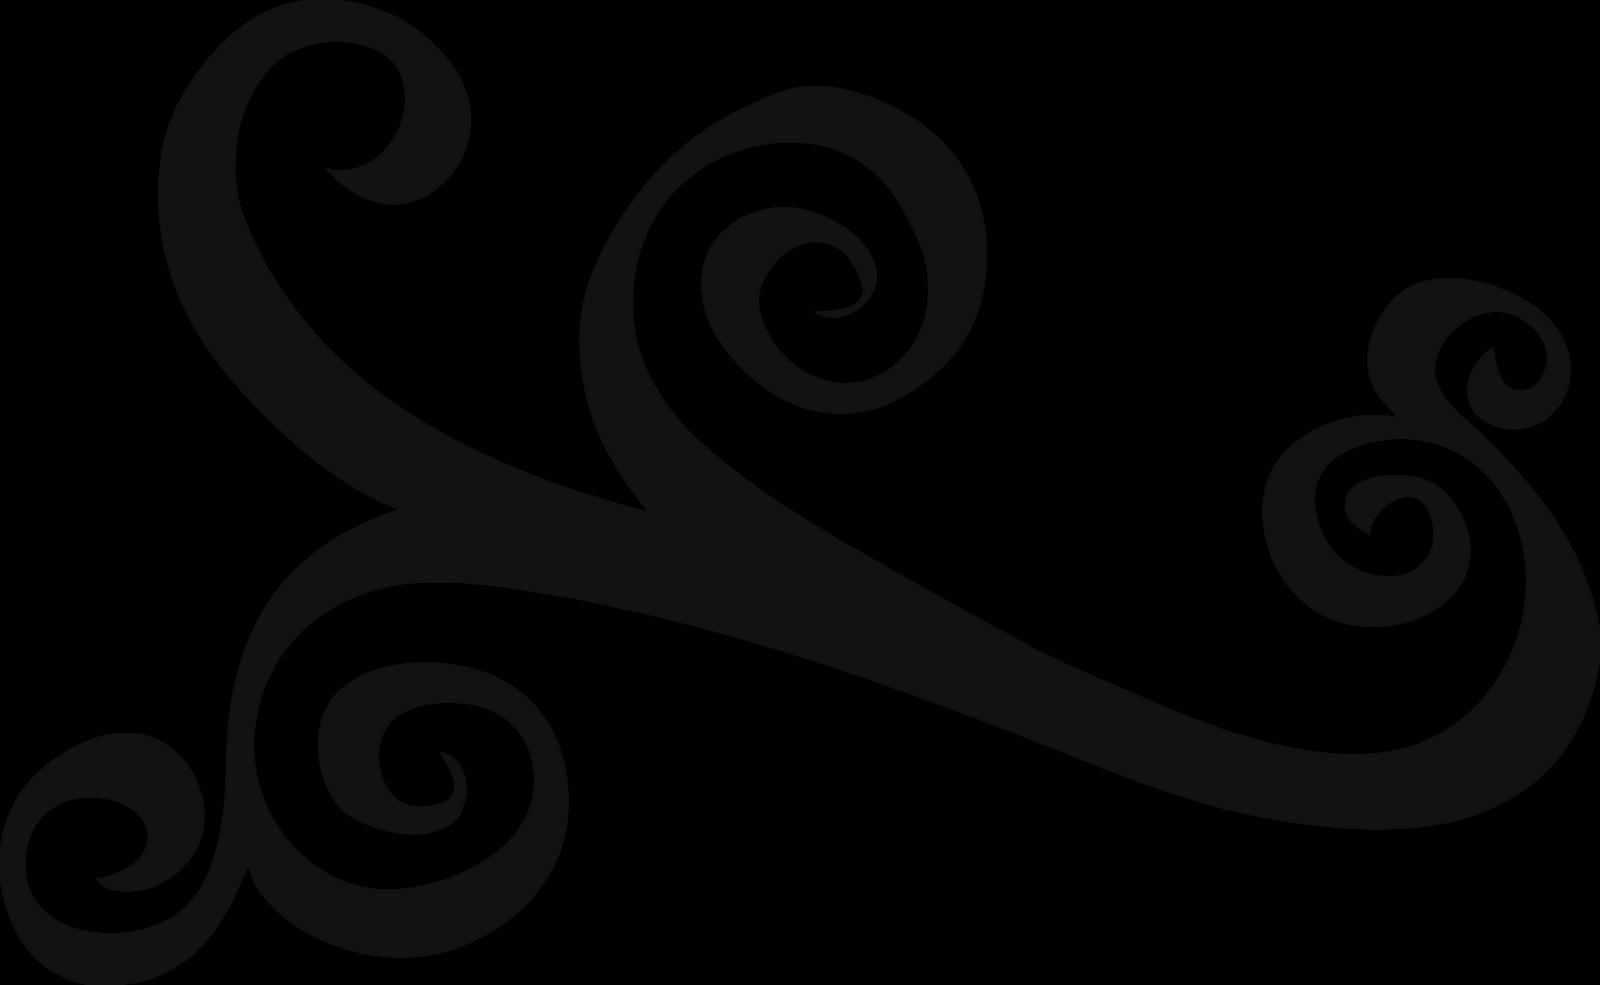 Simple Swirl Designs Clipart-Simple Swirl Designs Clipart-15